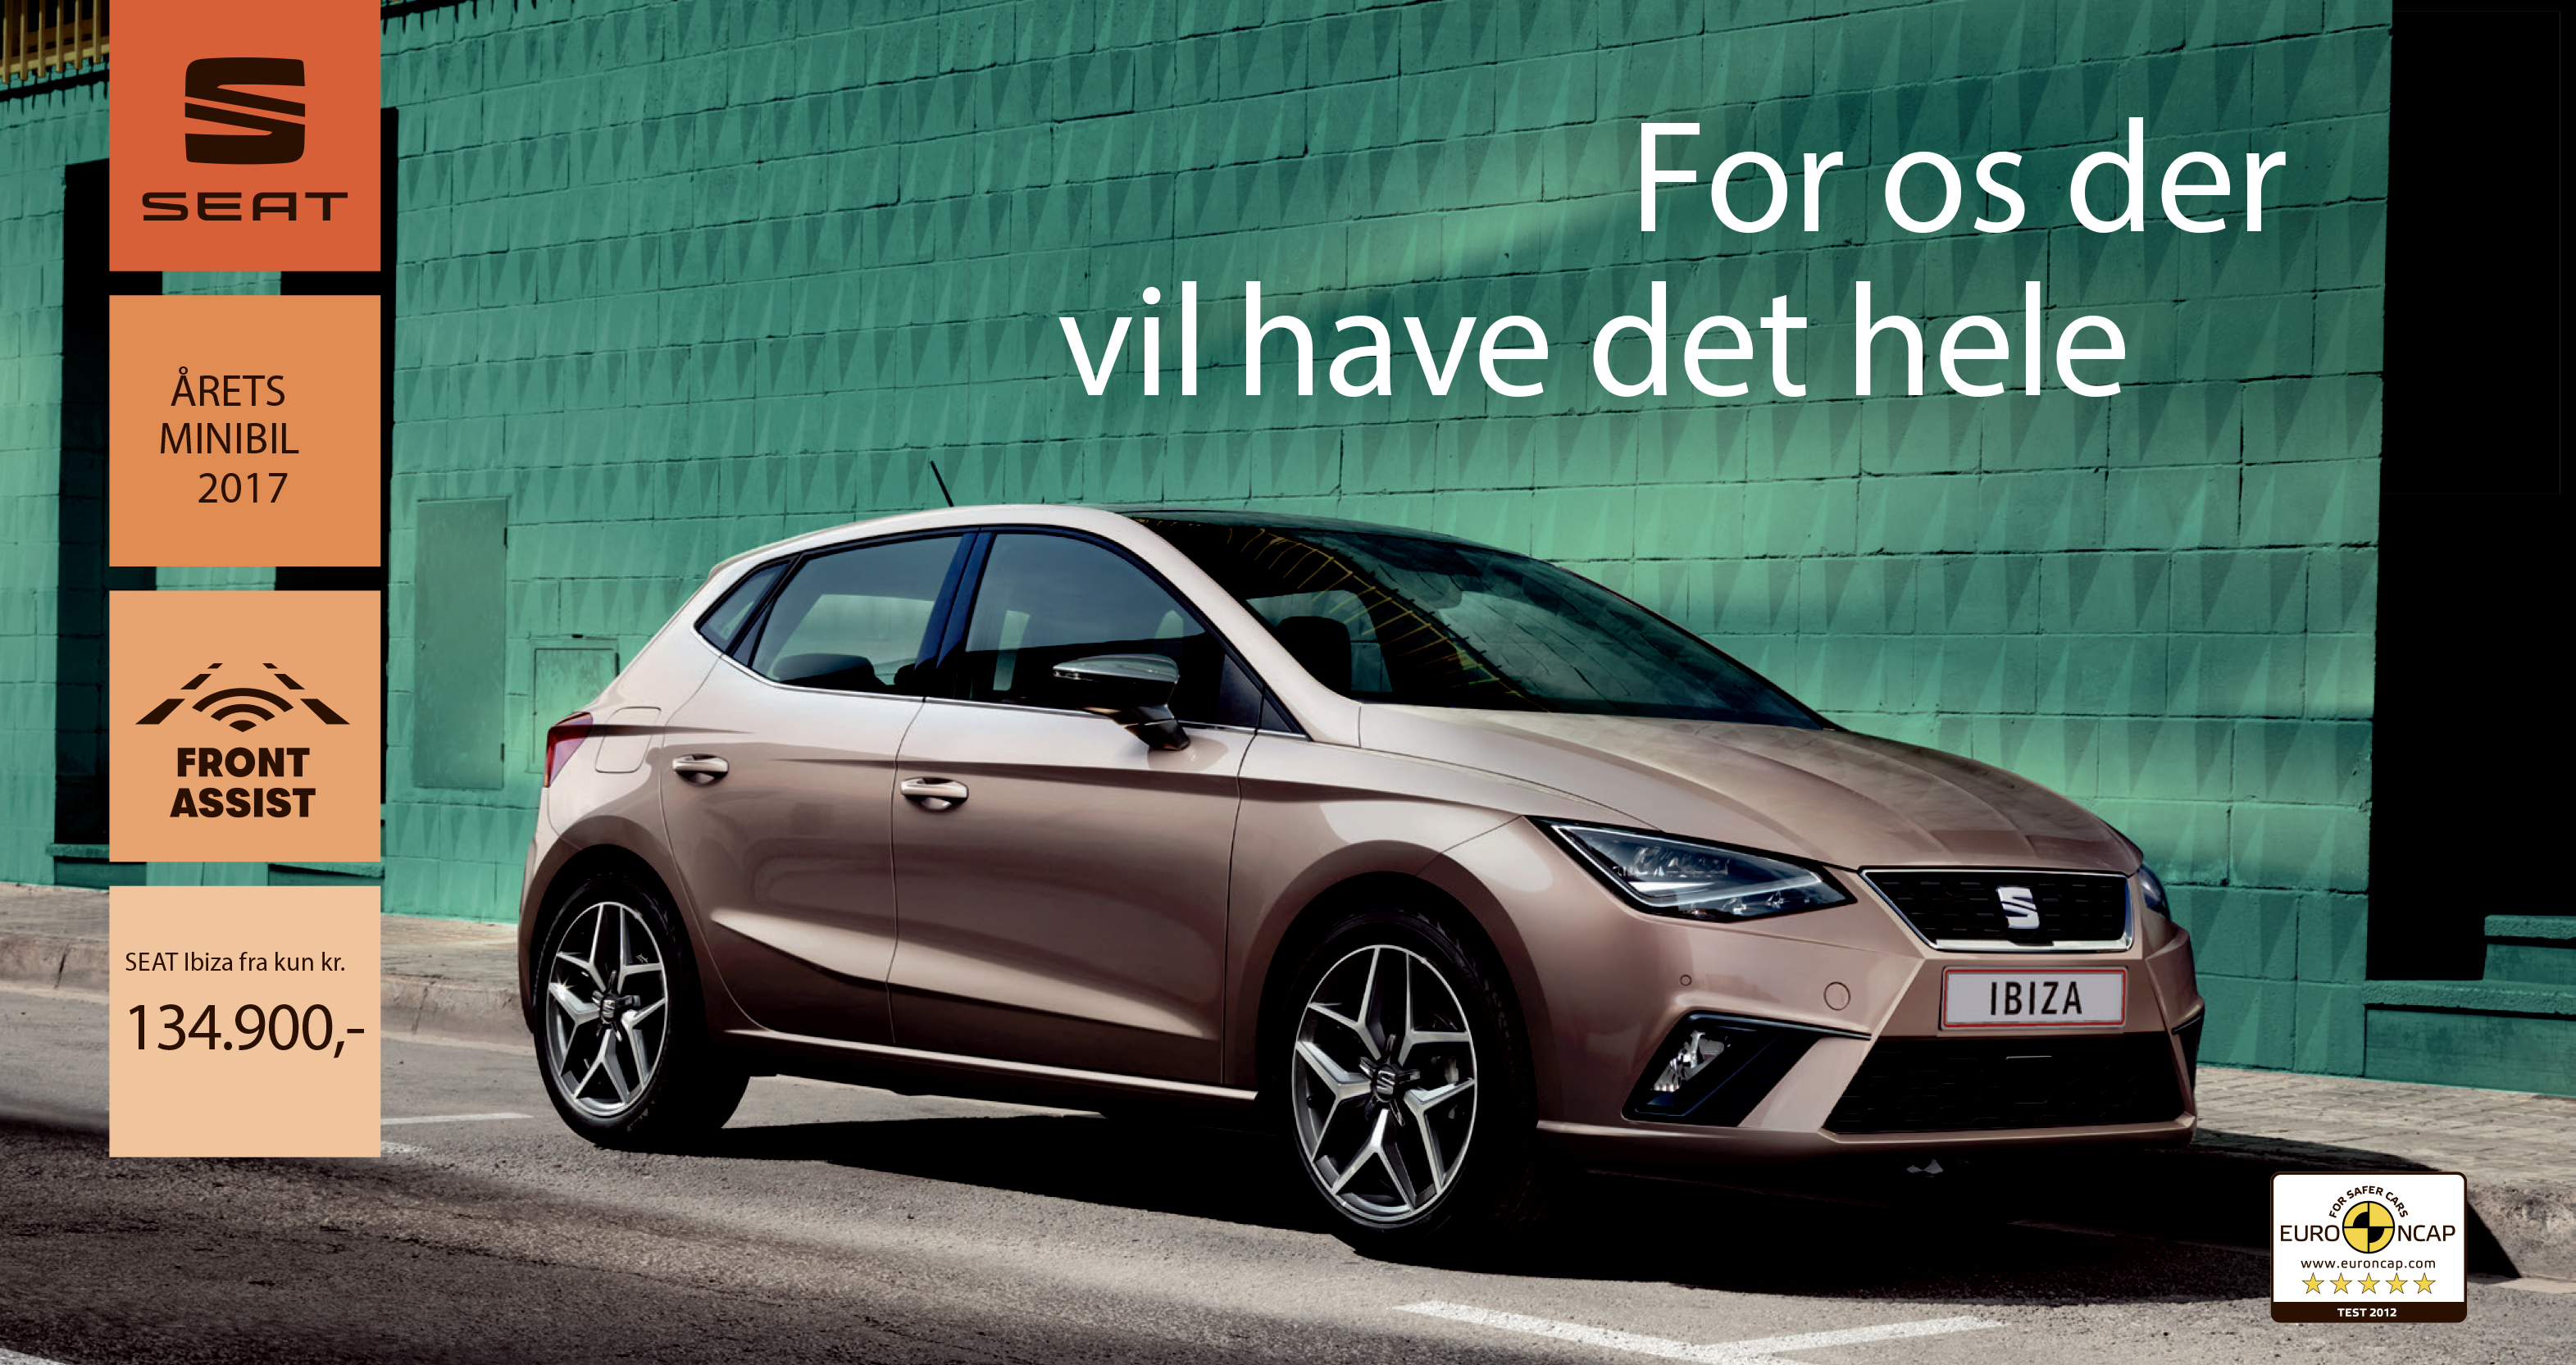 Seat_Ibiza_1440px.jpg | Daugaard Biler - Mazda, Opel, Seat, Ford, Citroen, Suzuki og Toyota